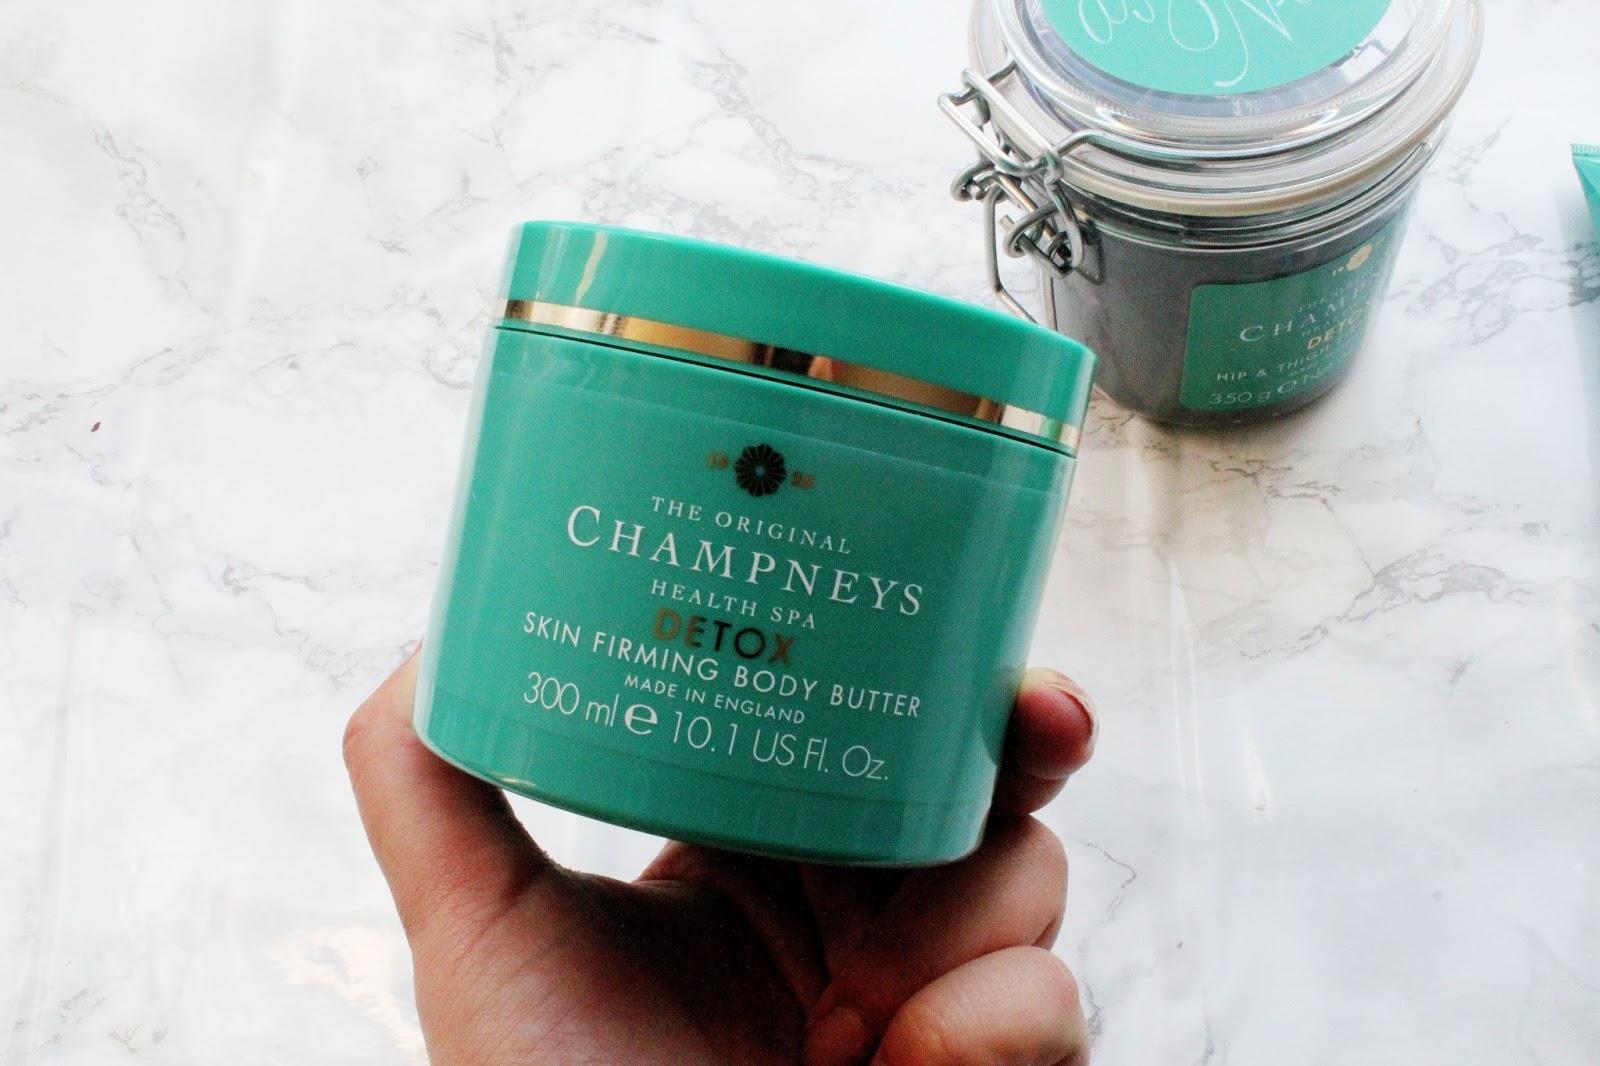 Beauty Champneys Health Spa Detox Range Review